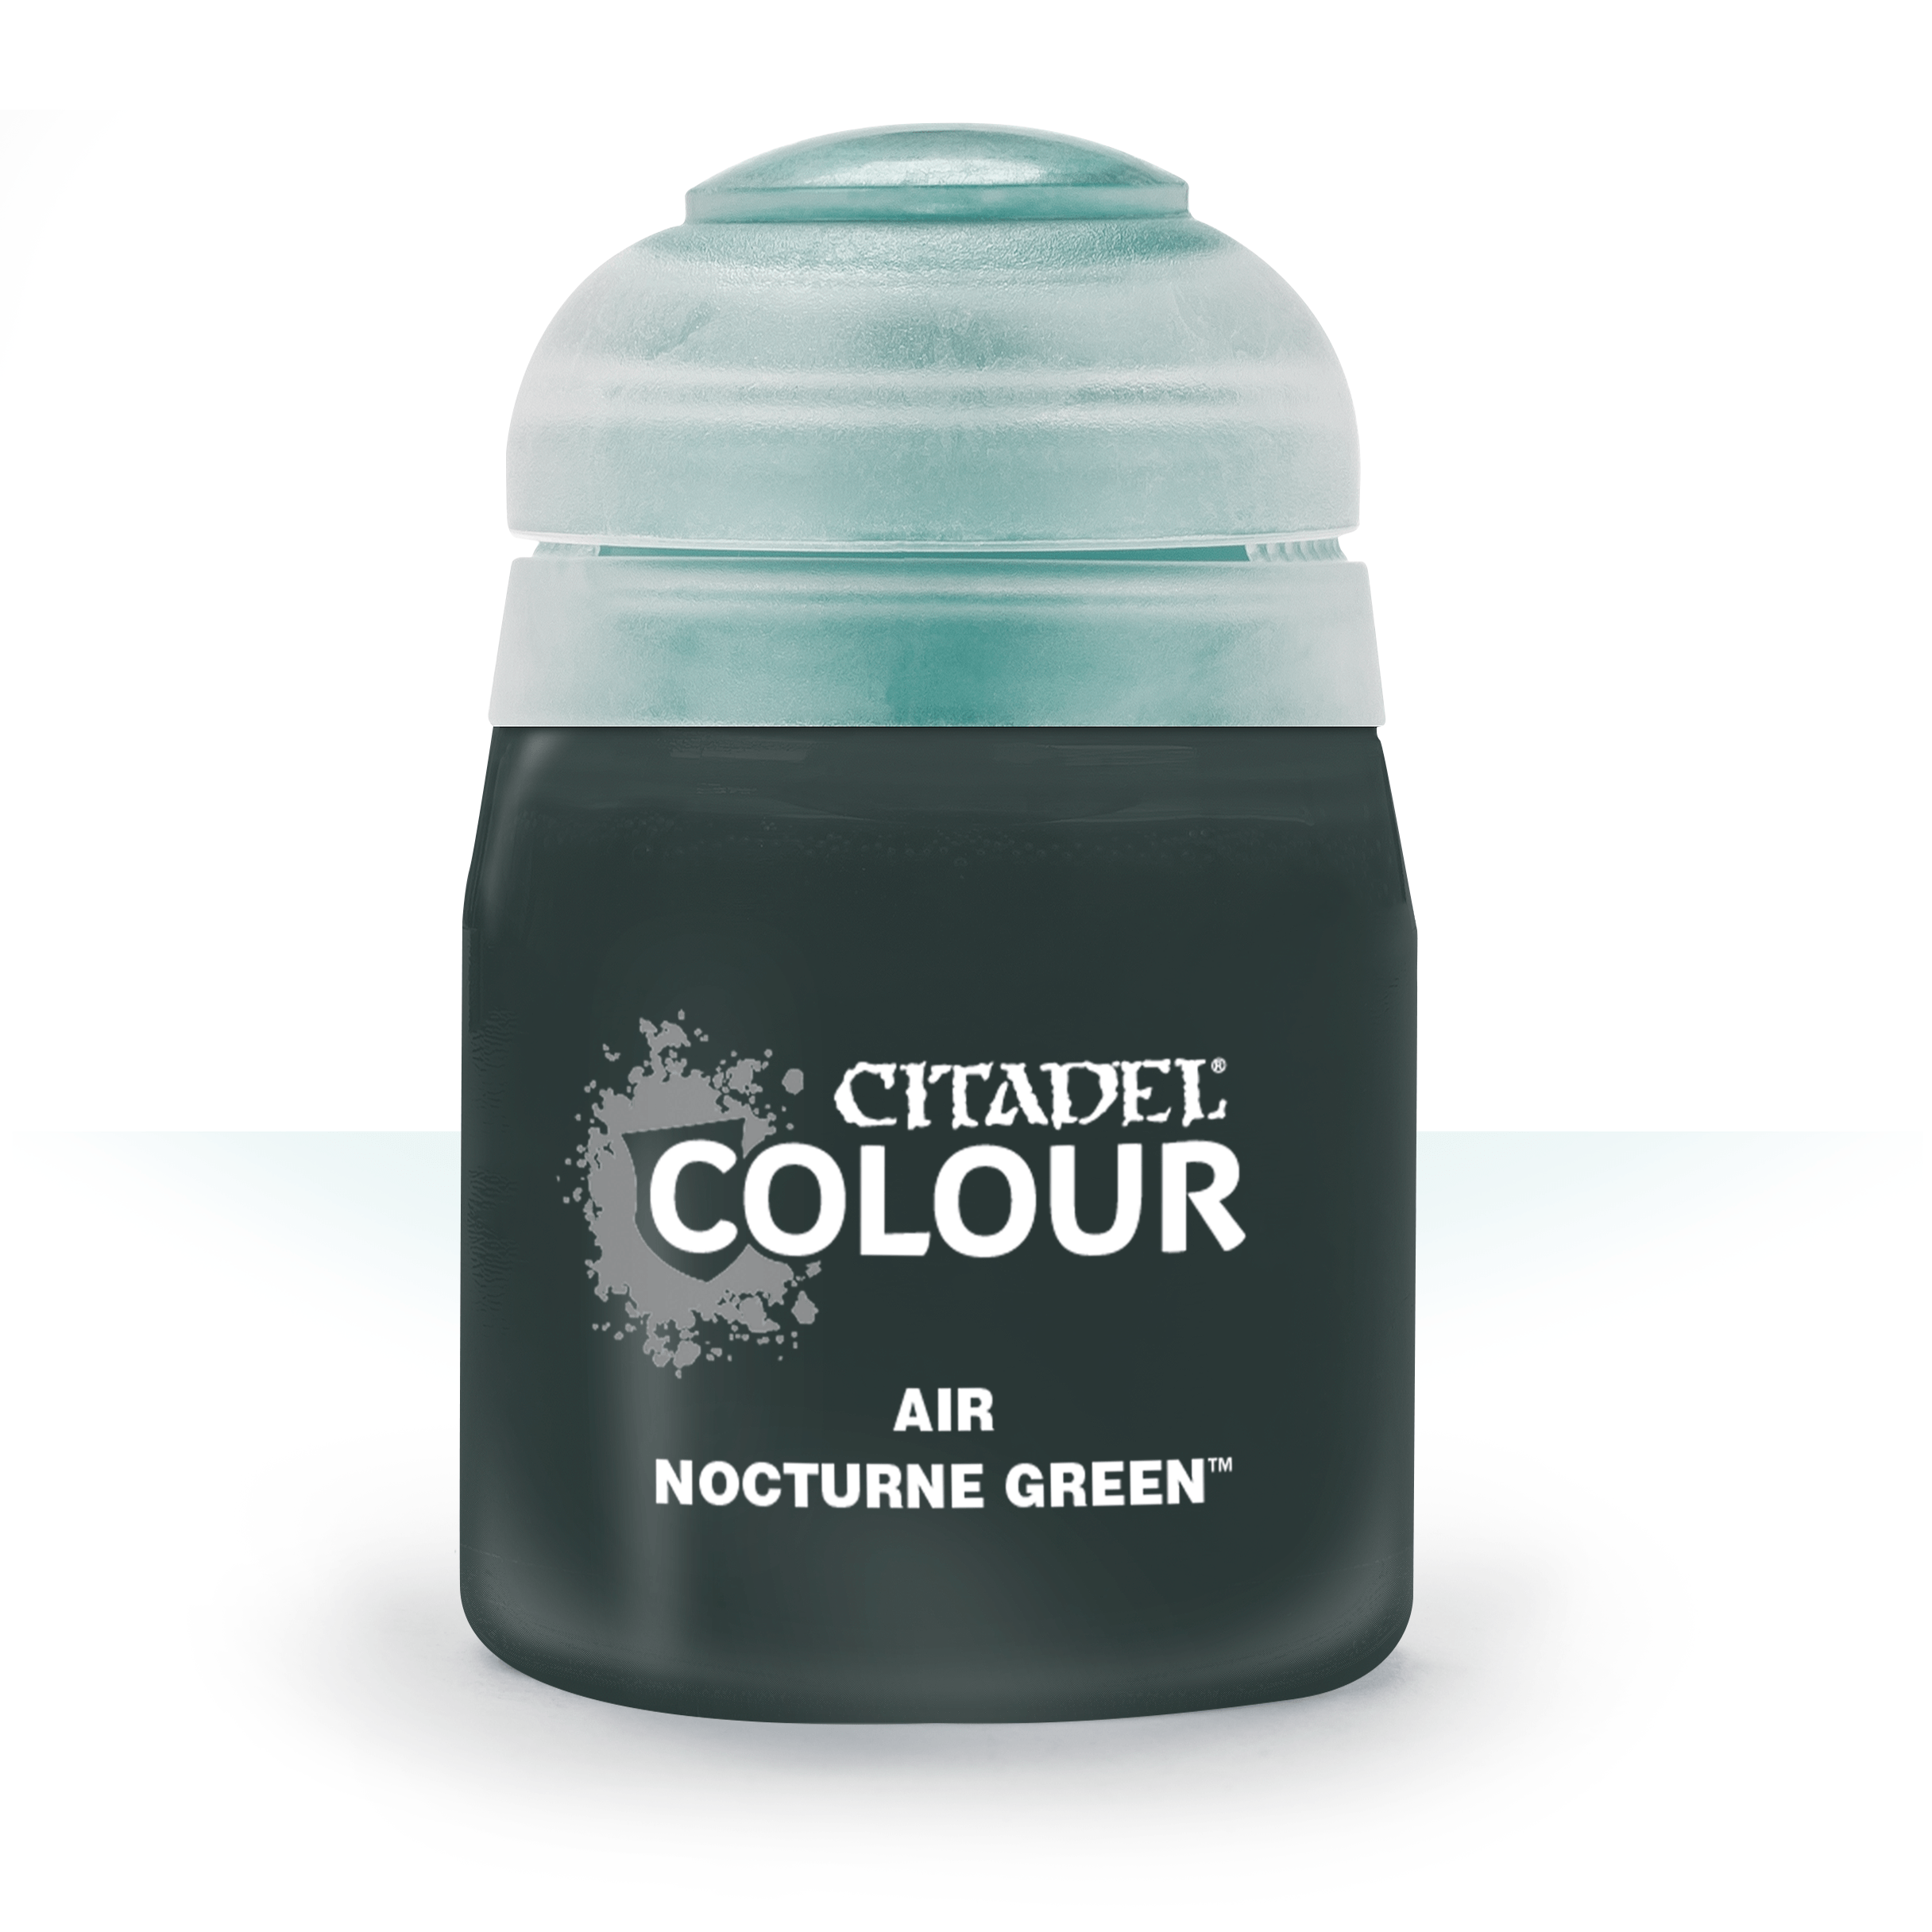 Nocturne Green, Citadel Air 24ml